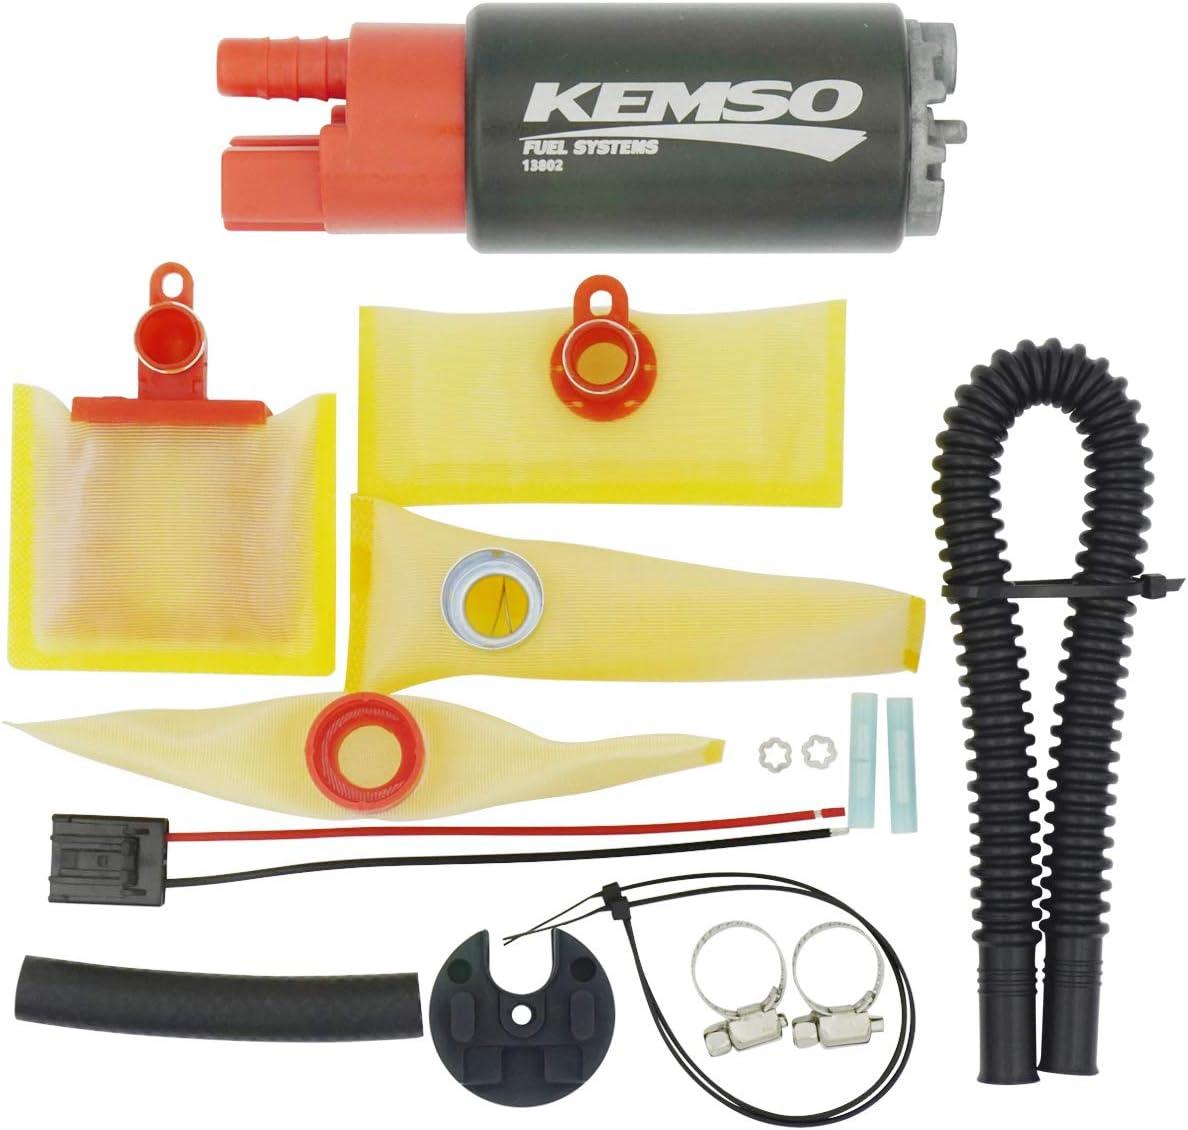 KEMSO Intank Fuel Pump for TNT Very popular! Selling rankings 2004-2011 1130 Benelli